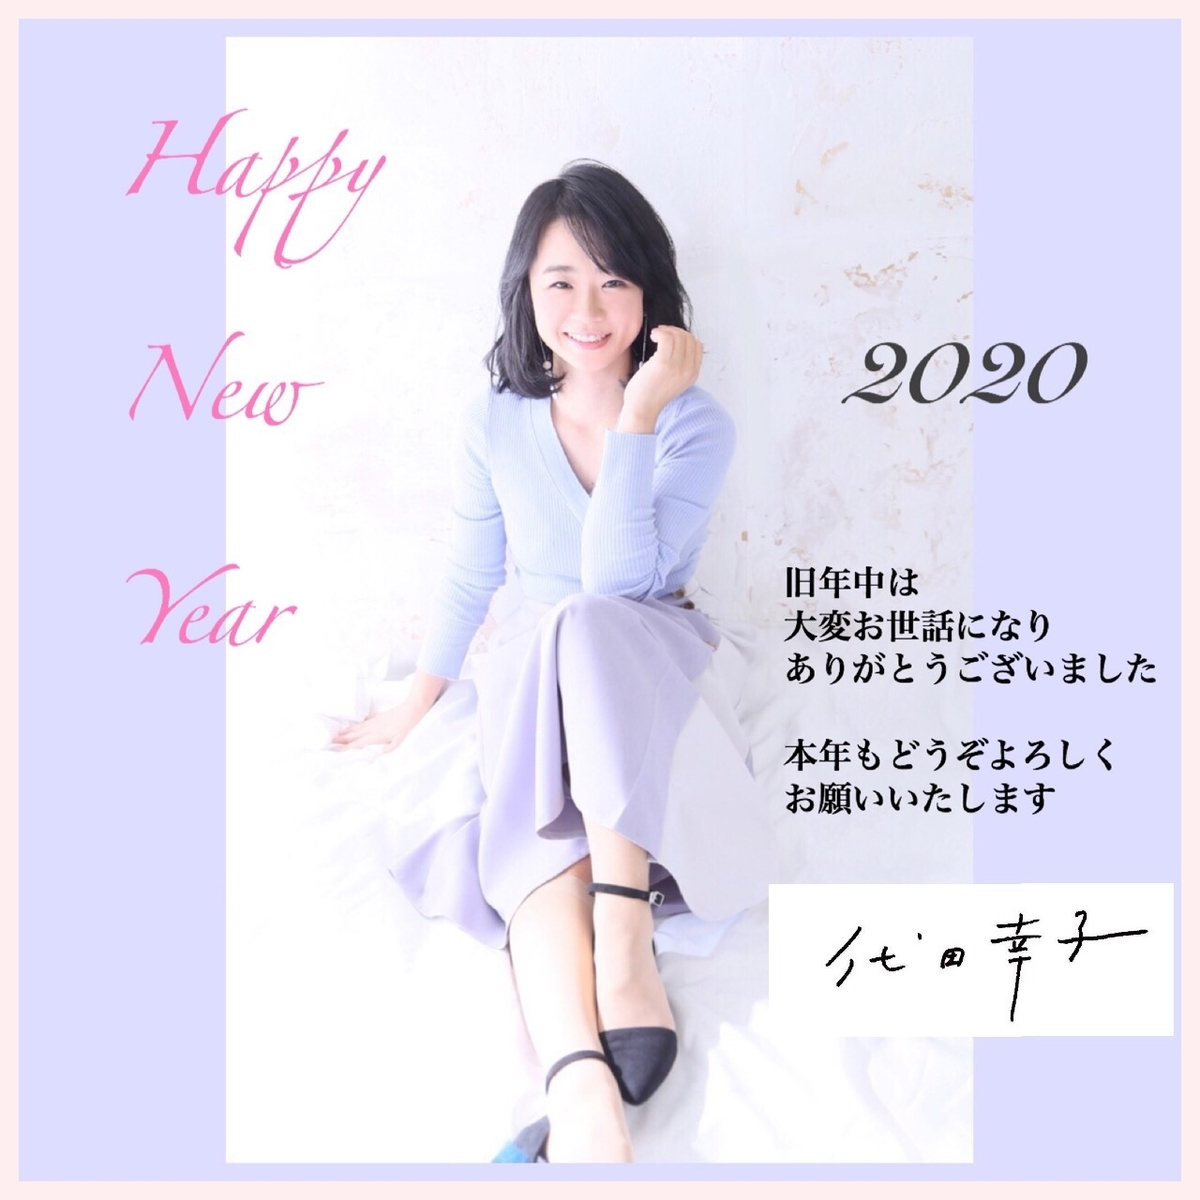 f:id:daitasachiko:20200101144754j:plain